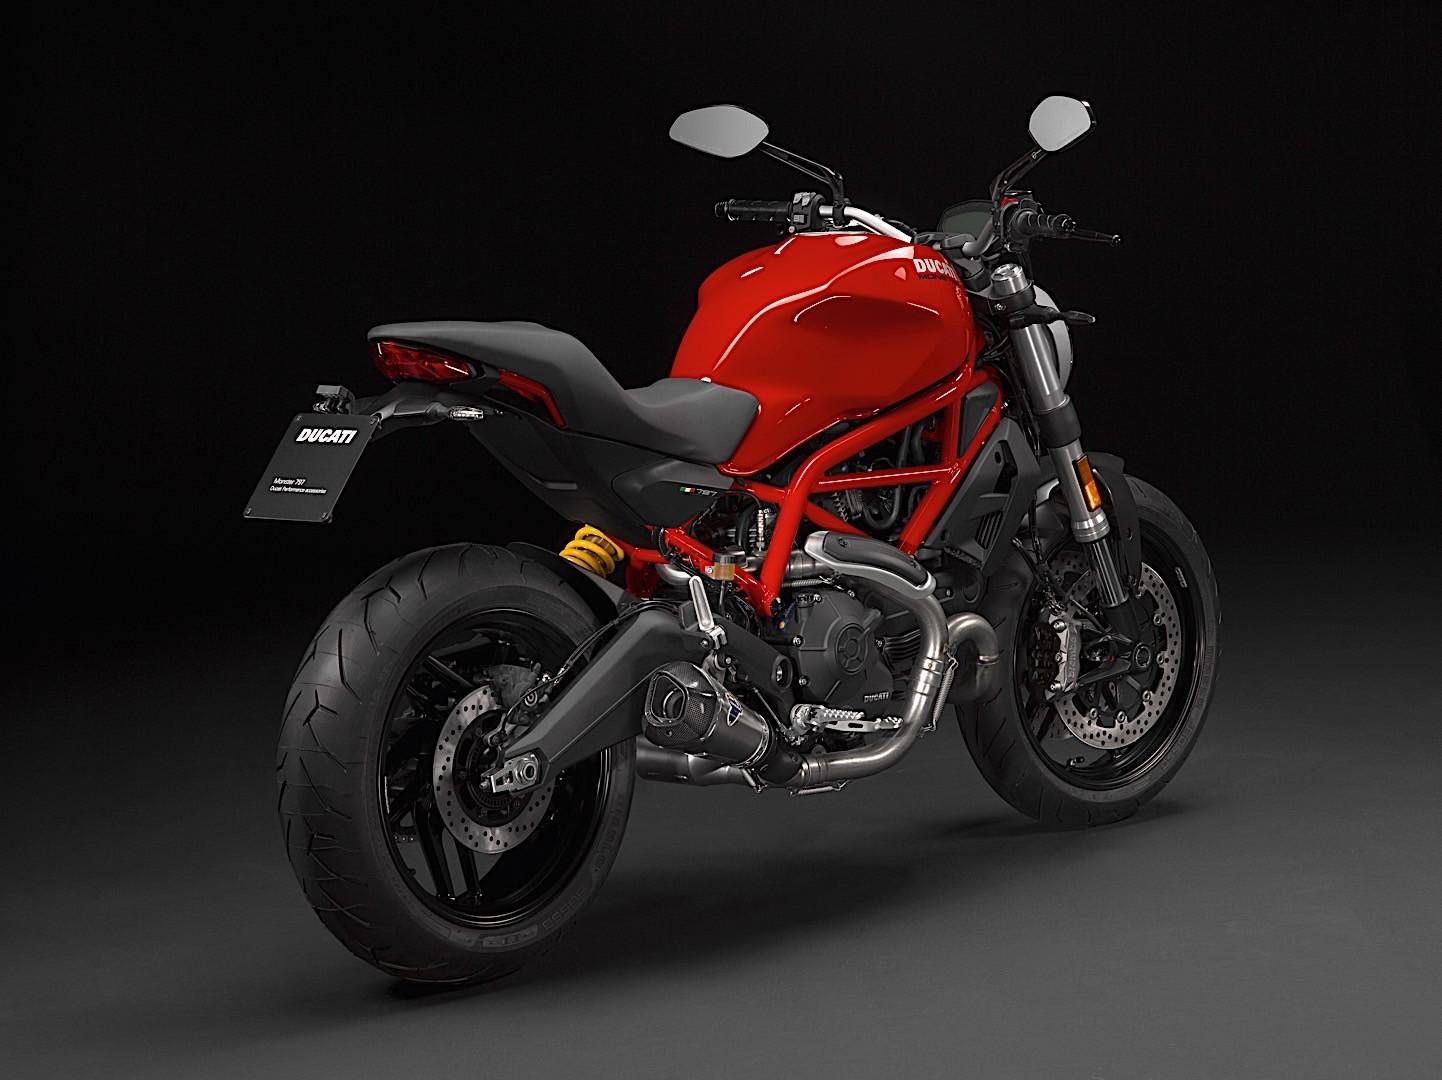 Ducati Monster Accessories Singapore